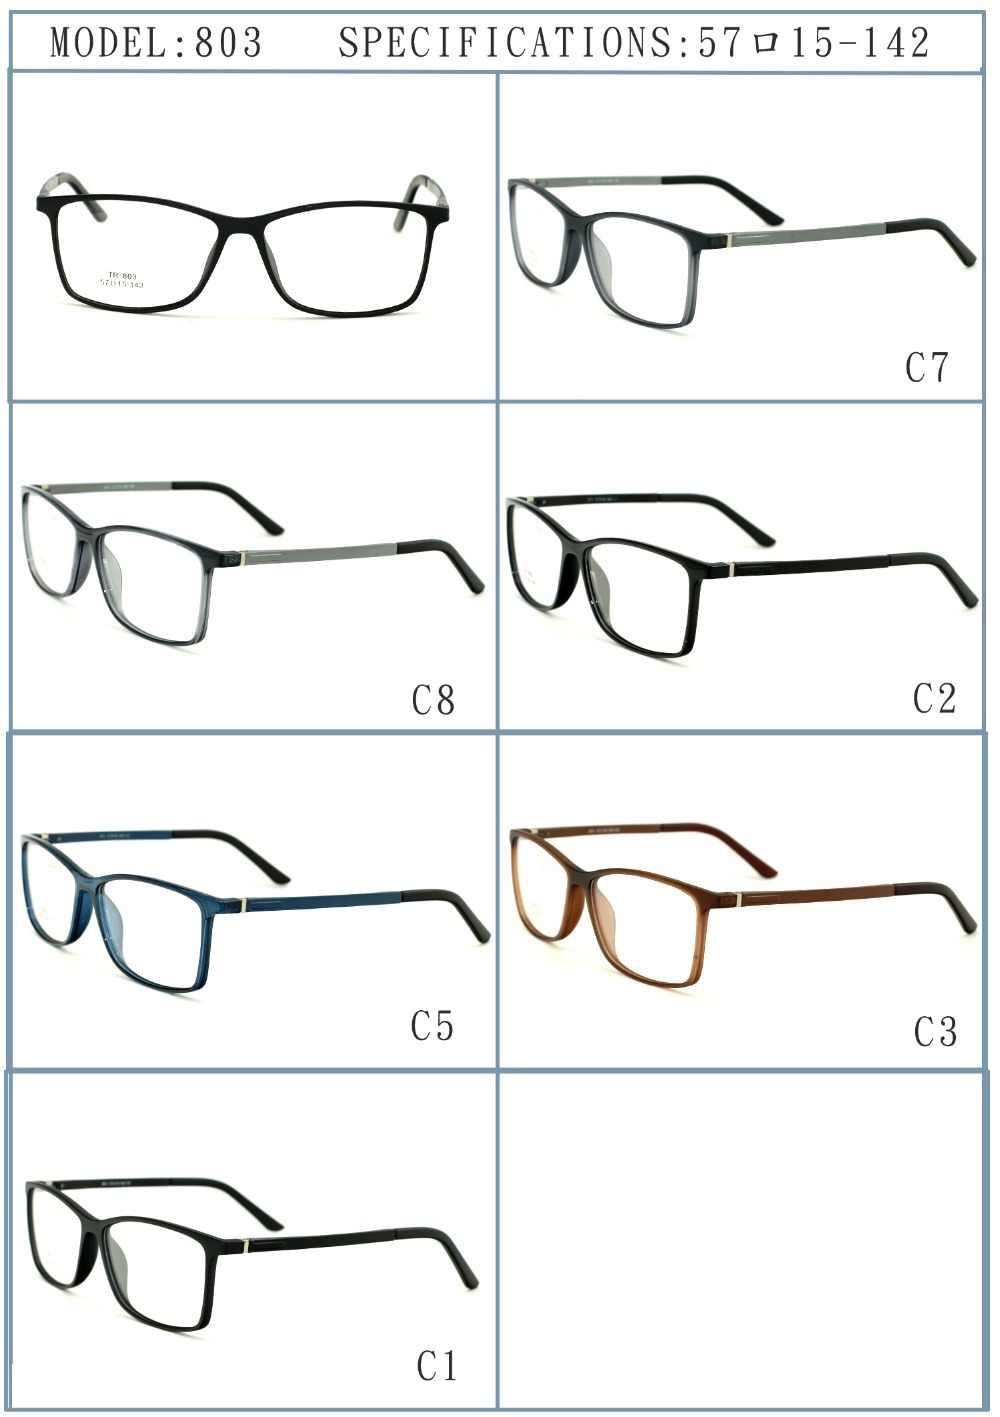 8b376e45341 ... 2018 new TR90 front Aluminum glasses frame men women prescription  myopia optical brand clear eyeglass frames. RELATED PRODUCTS. 2018 High  Quality ...